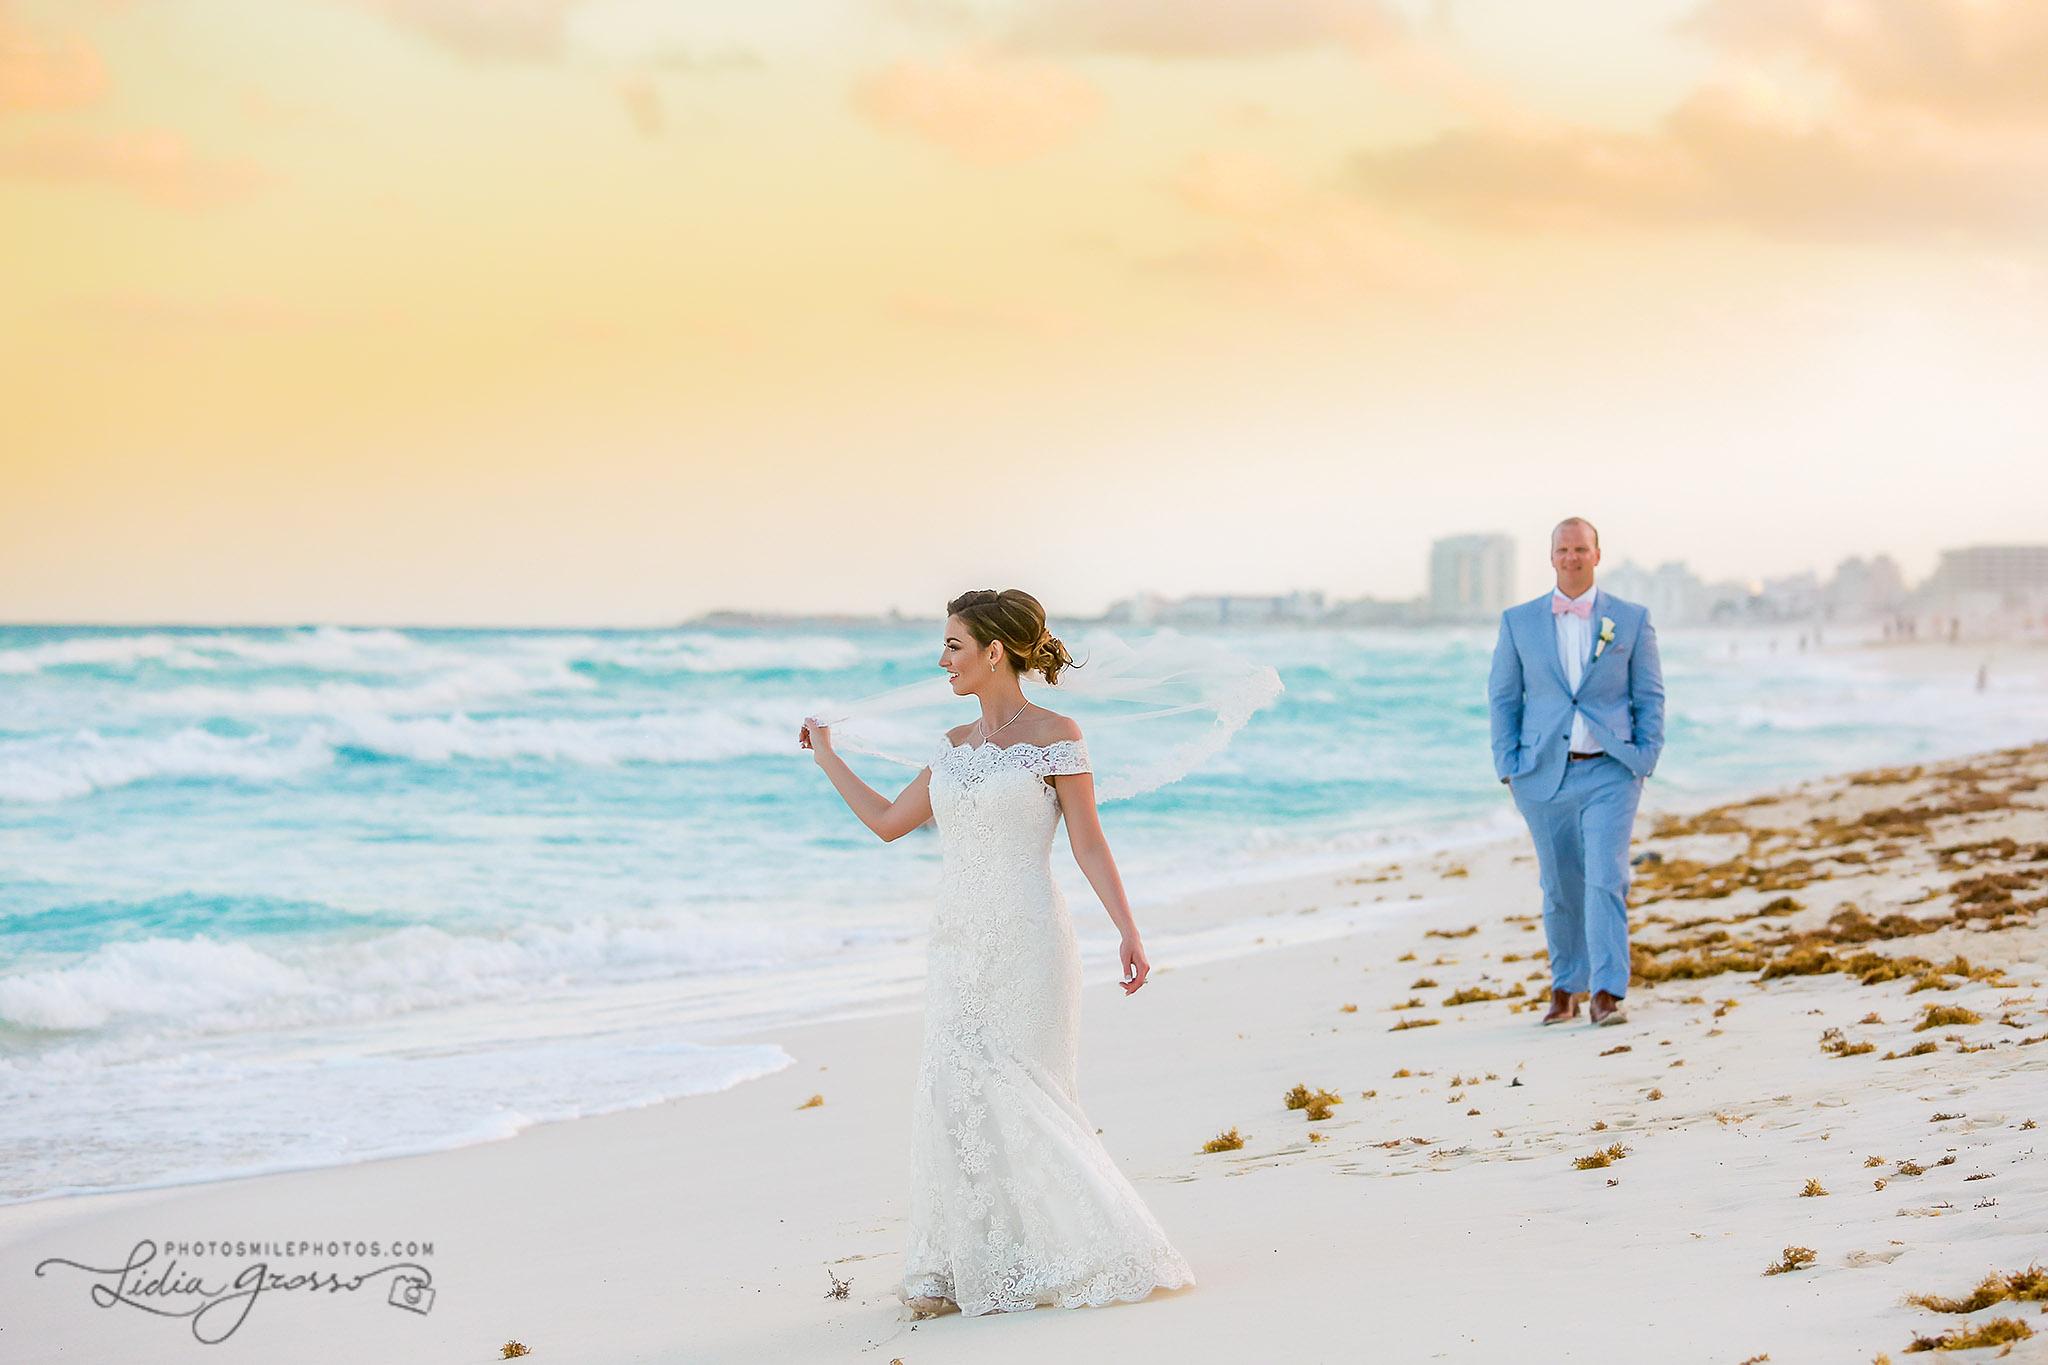 Sarah-Cory-wedding-Fiesta-Condesa-515s.jpg